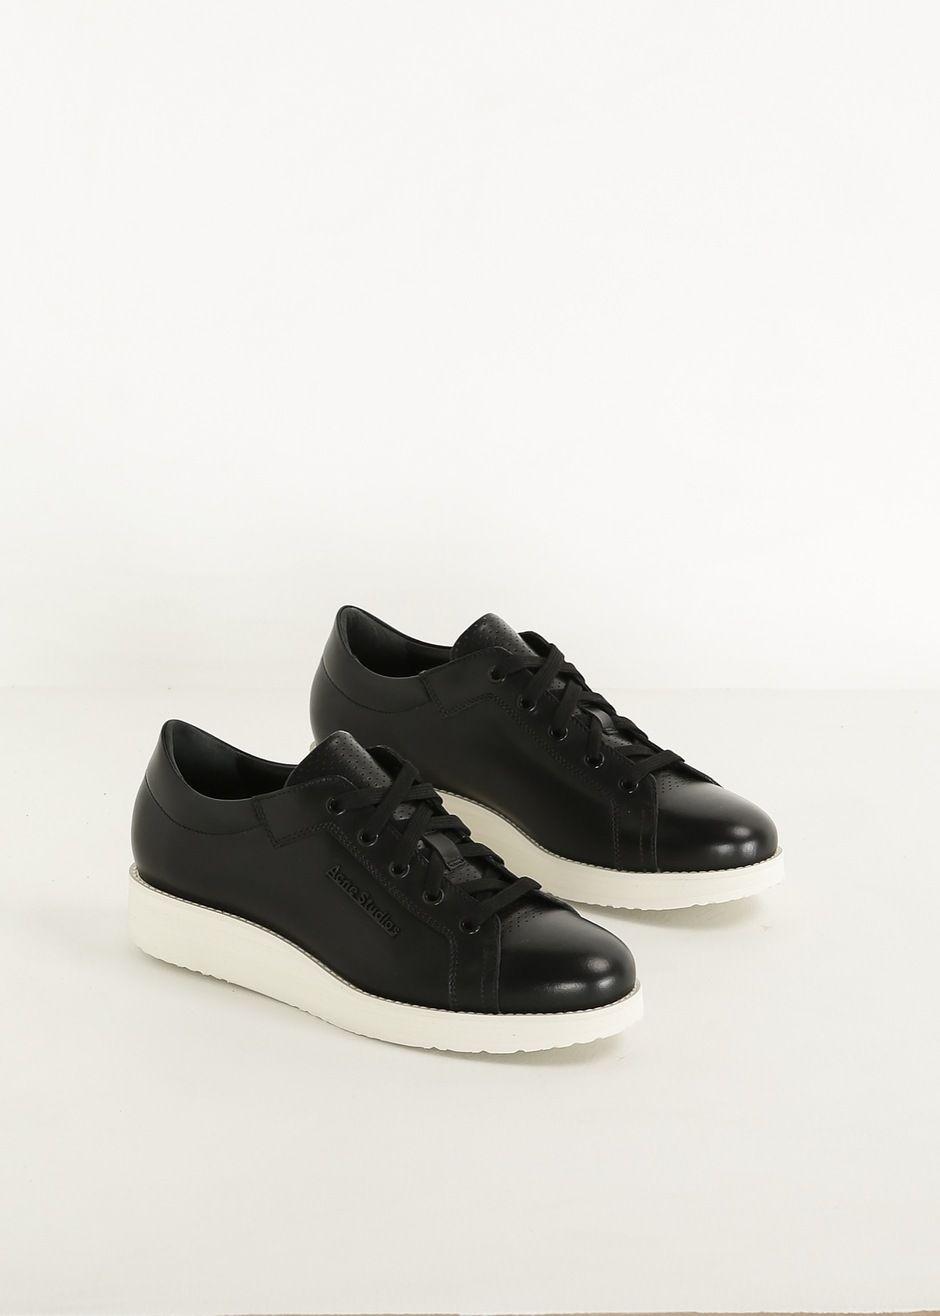 Totokaelo Acne Studios Black Kobe Sneaker 440 00 Kobe Sneakers Sneakers Dress Shoes Men [ 1316 x 940 Pixel ]